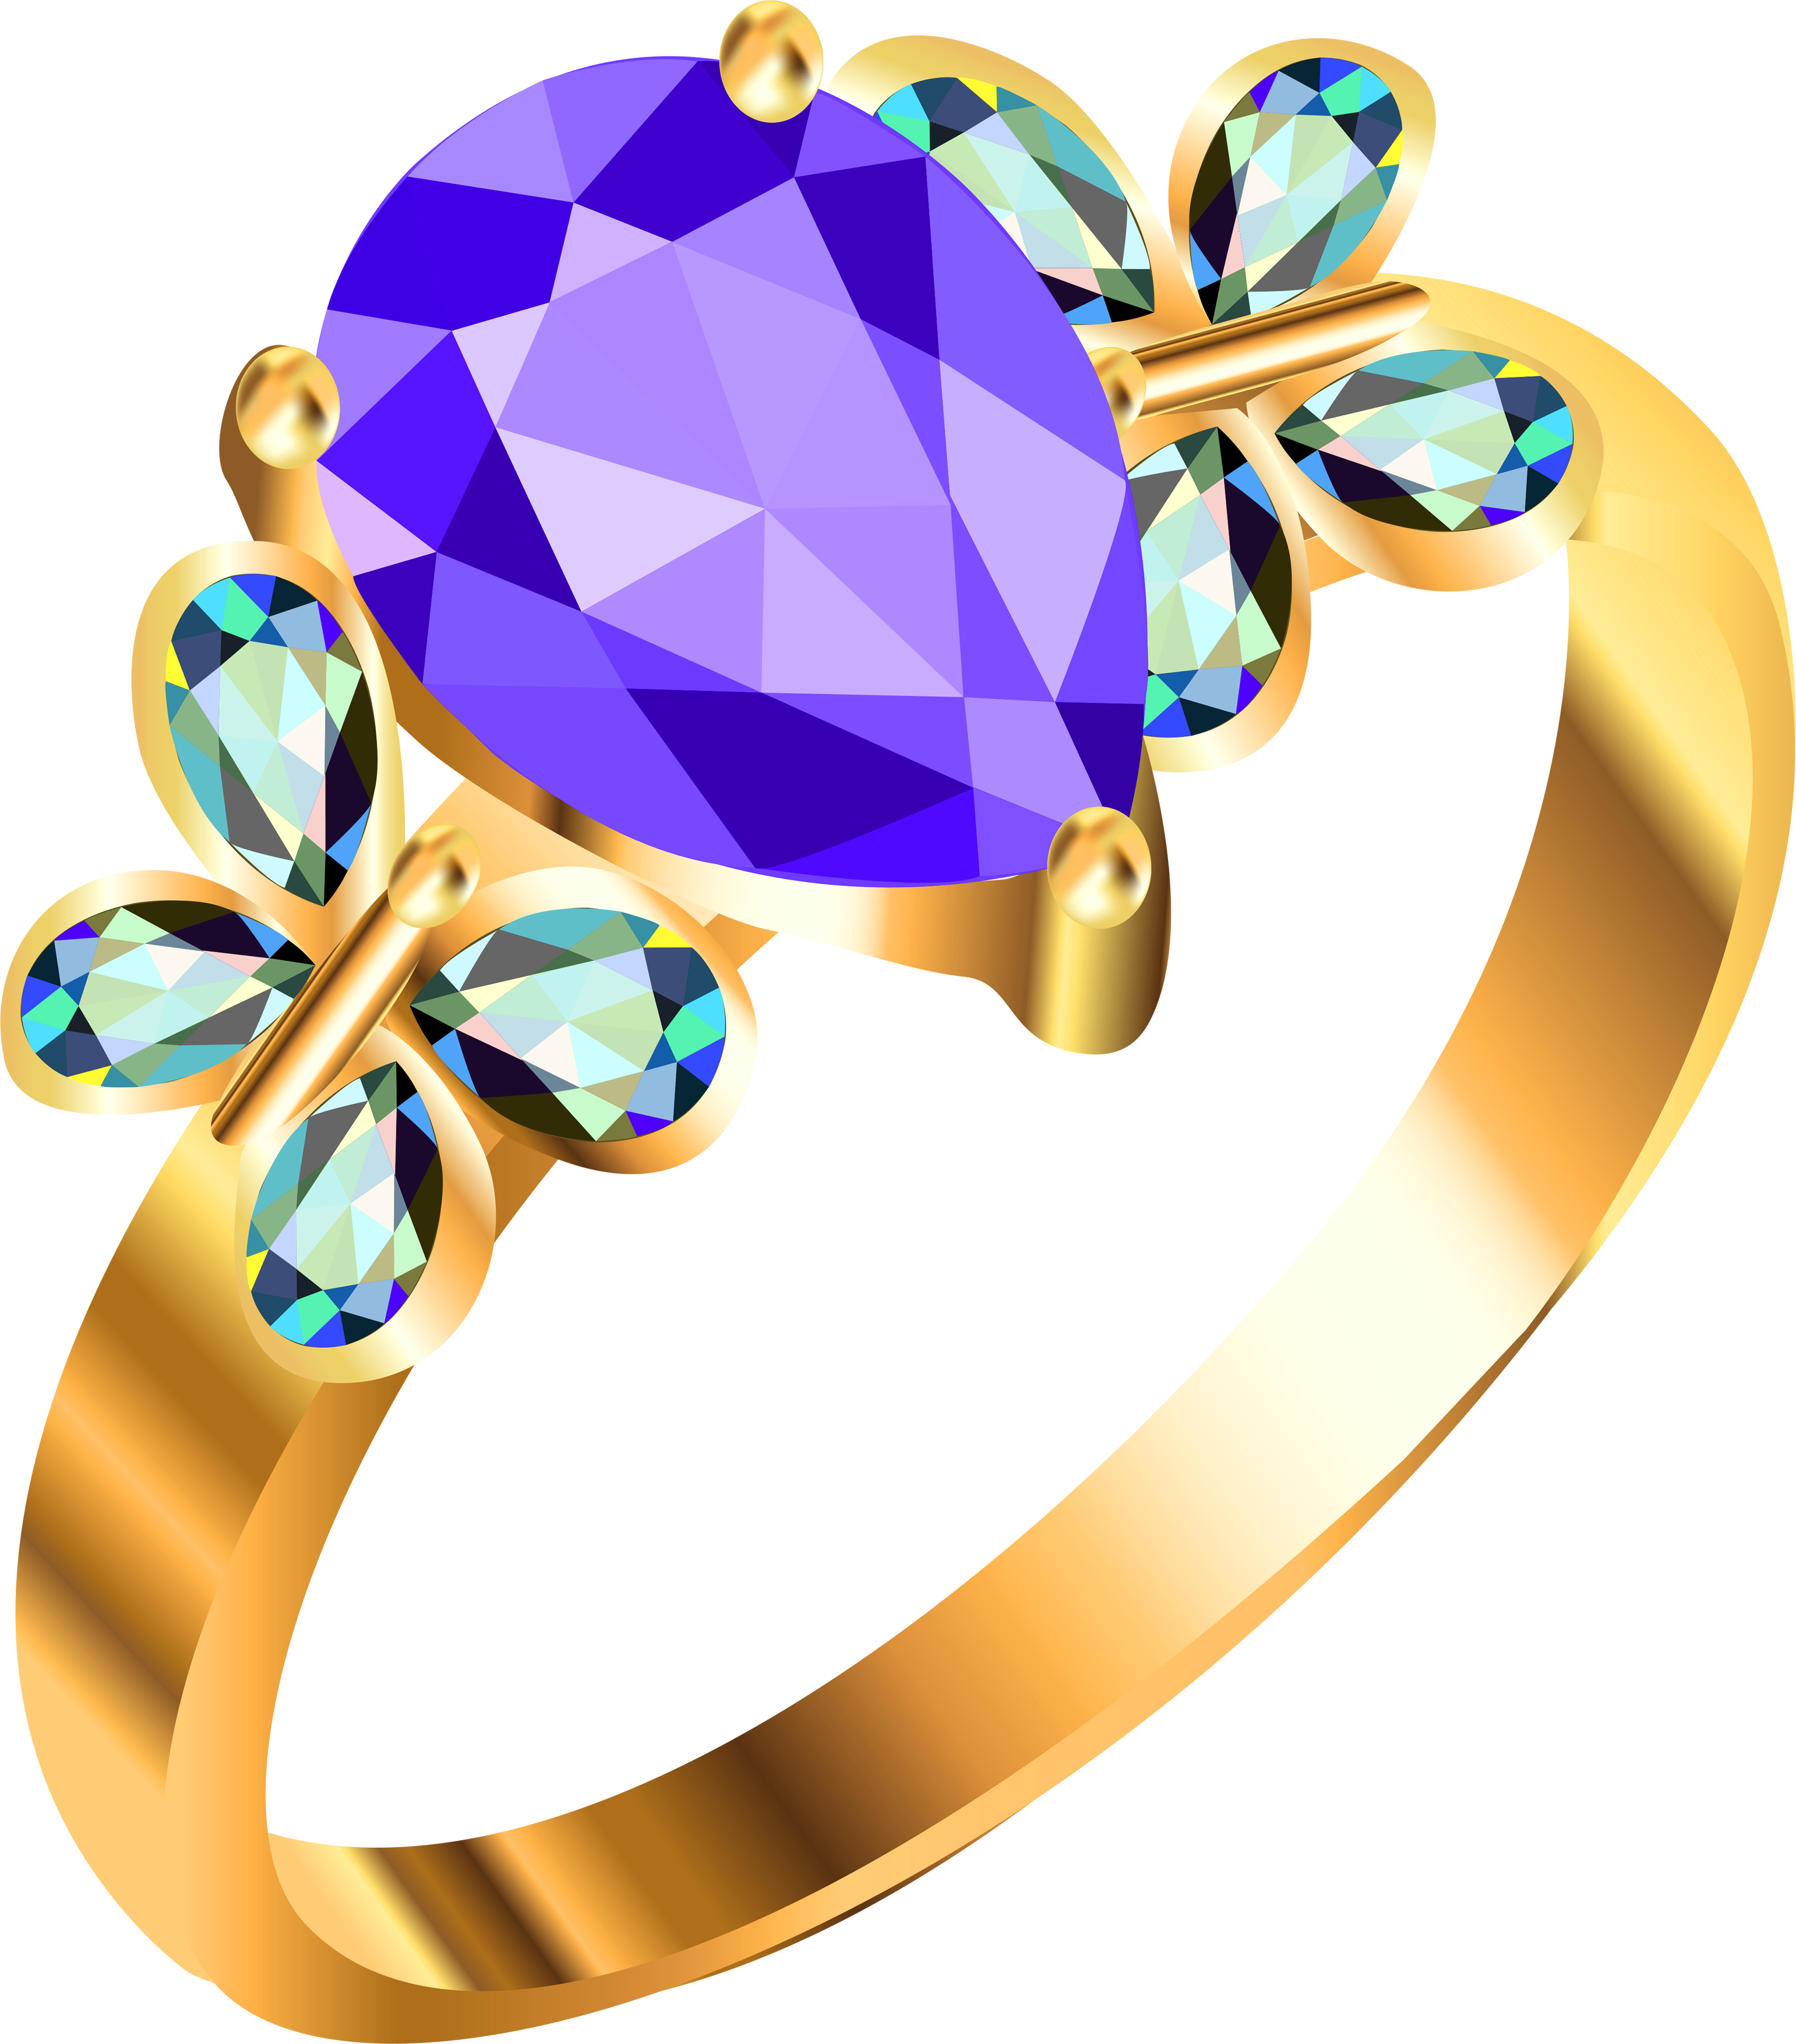 3083x3509 Jewelry Clipart